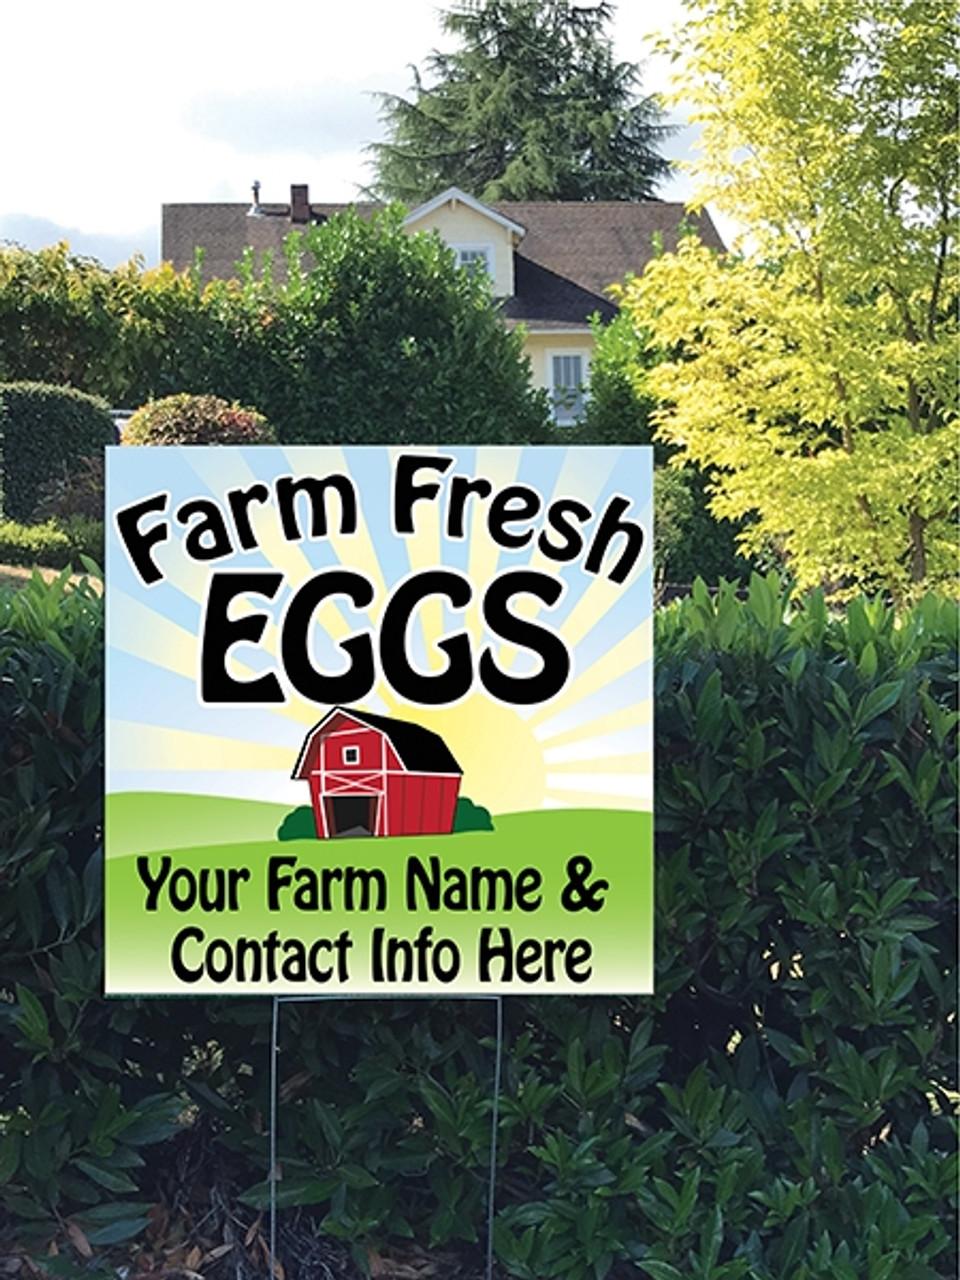 24 x 24 Yard Sign - Sunrise Barn Farm Fresh Eggs